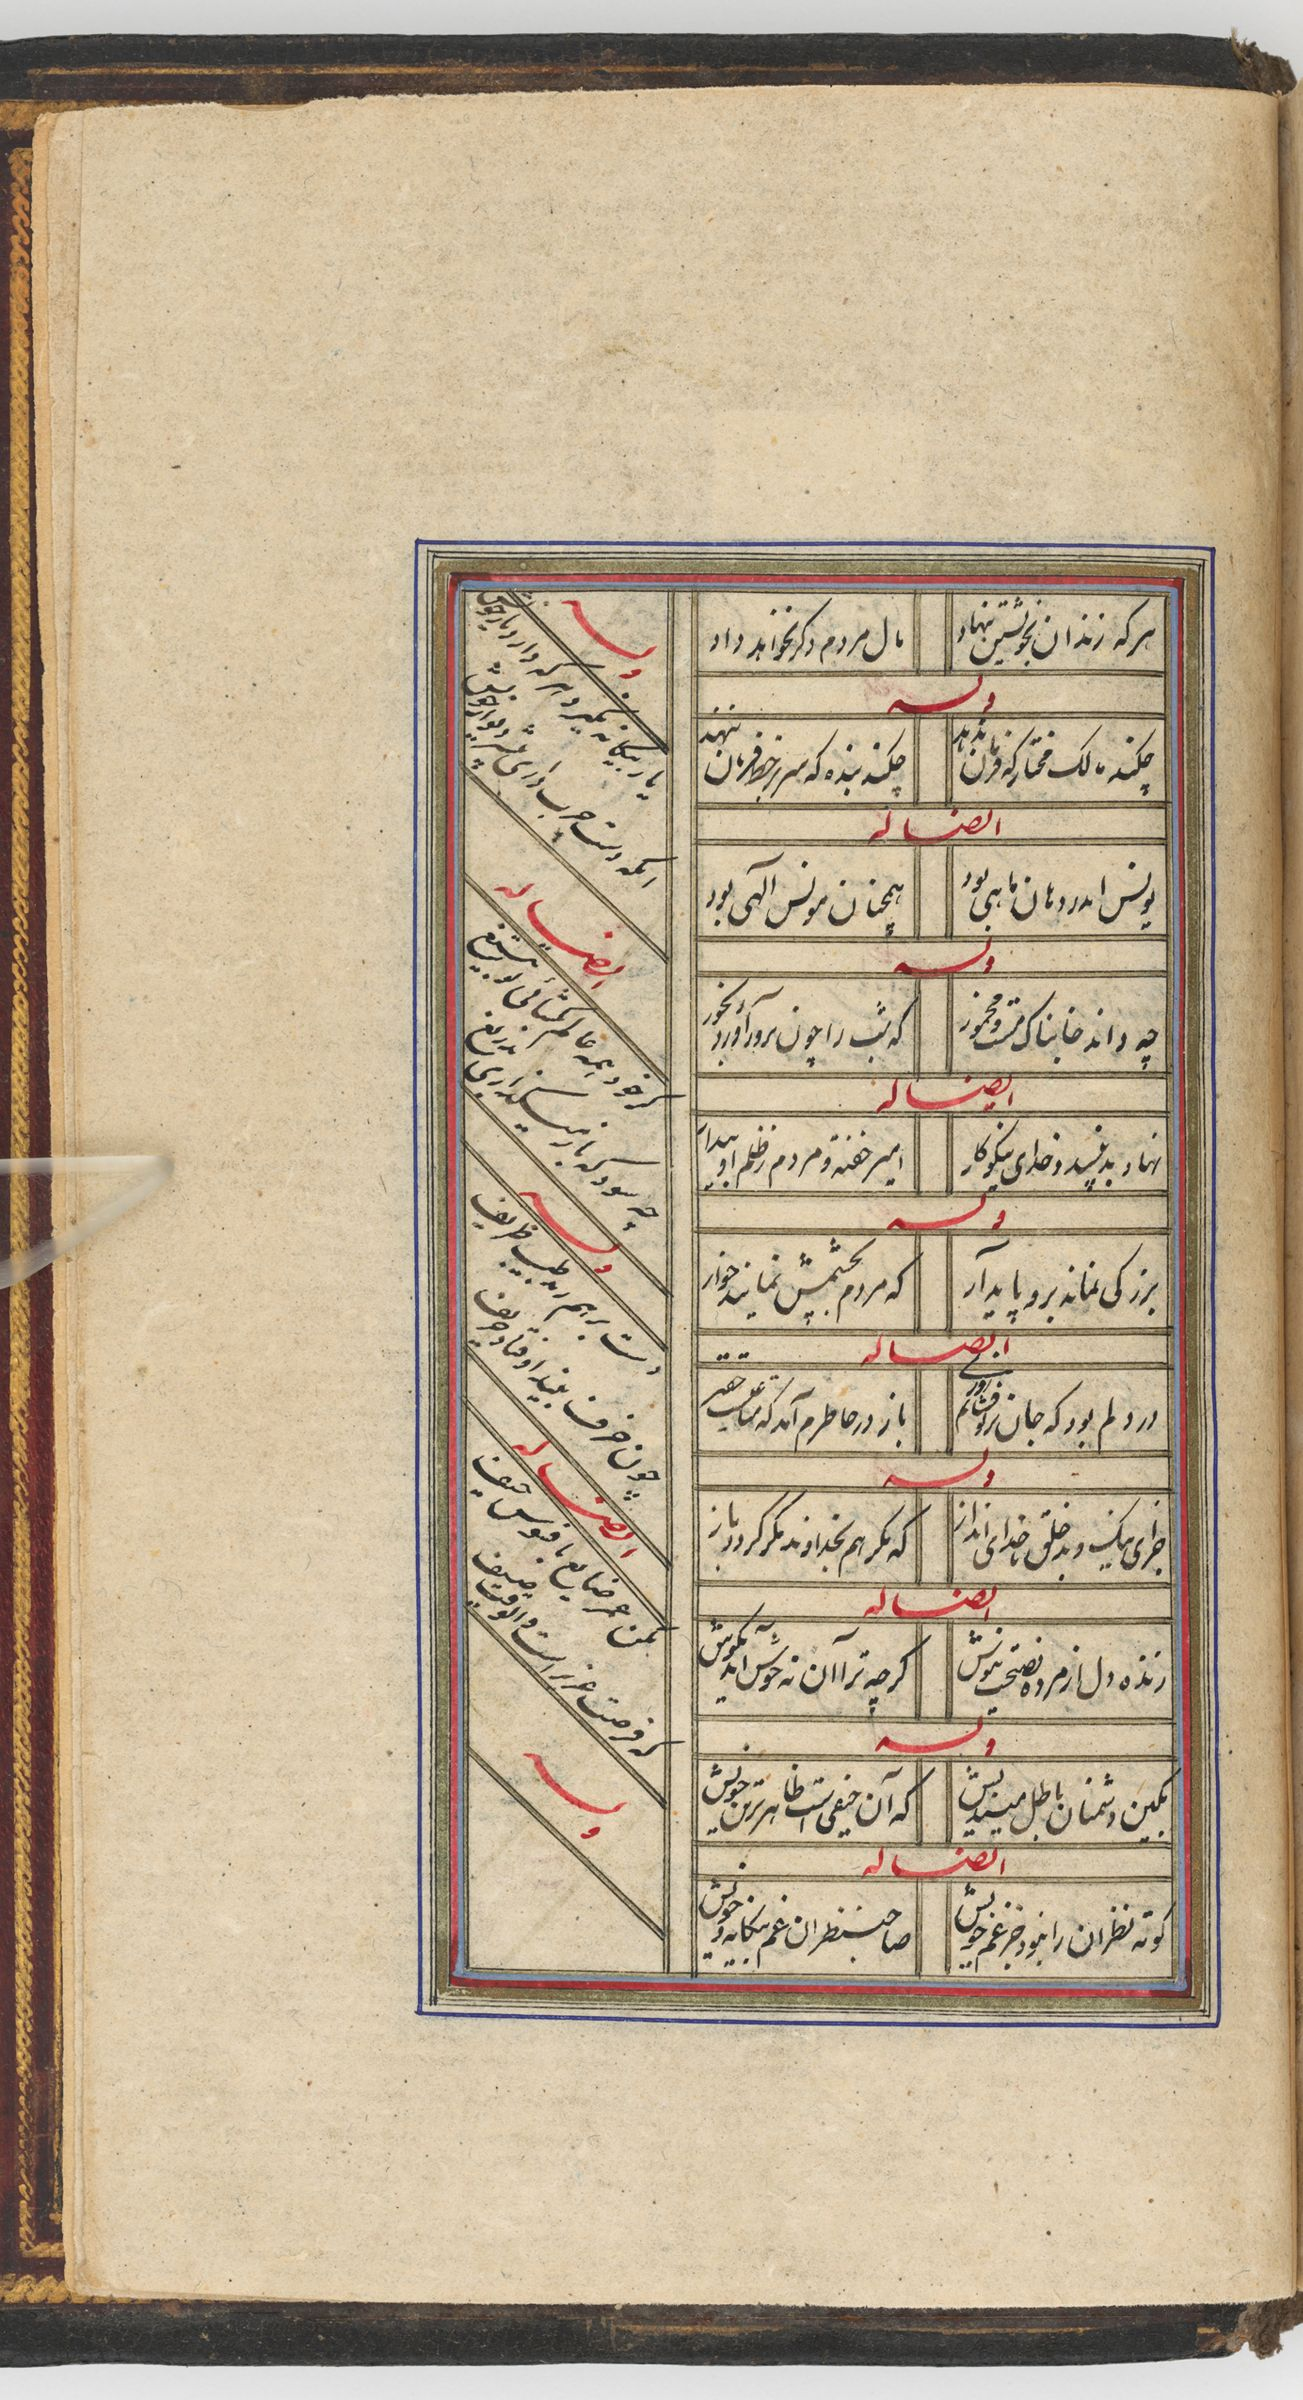 Text Folio (Text Recto; Text Verso Of Folio 348), From A Manuscript Of The Kulliyat Of Sa'di